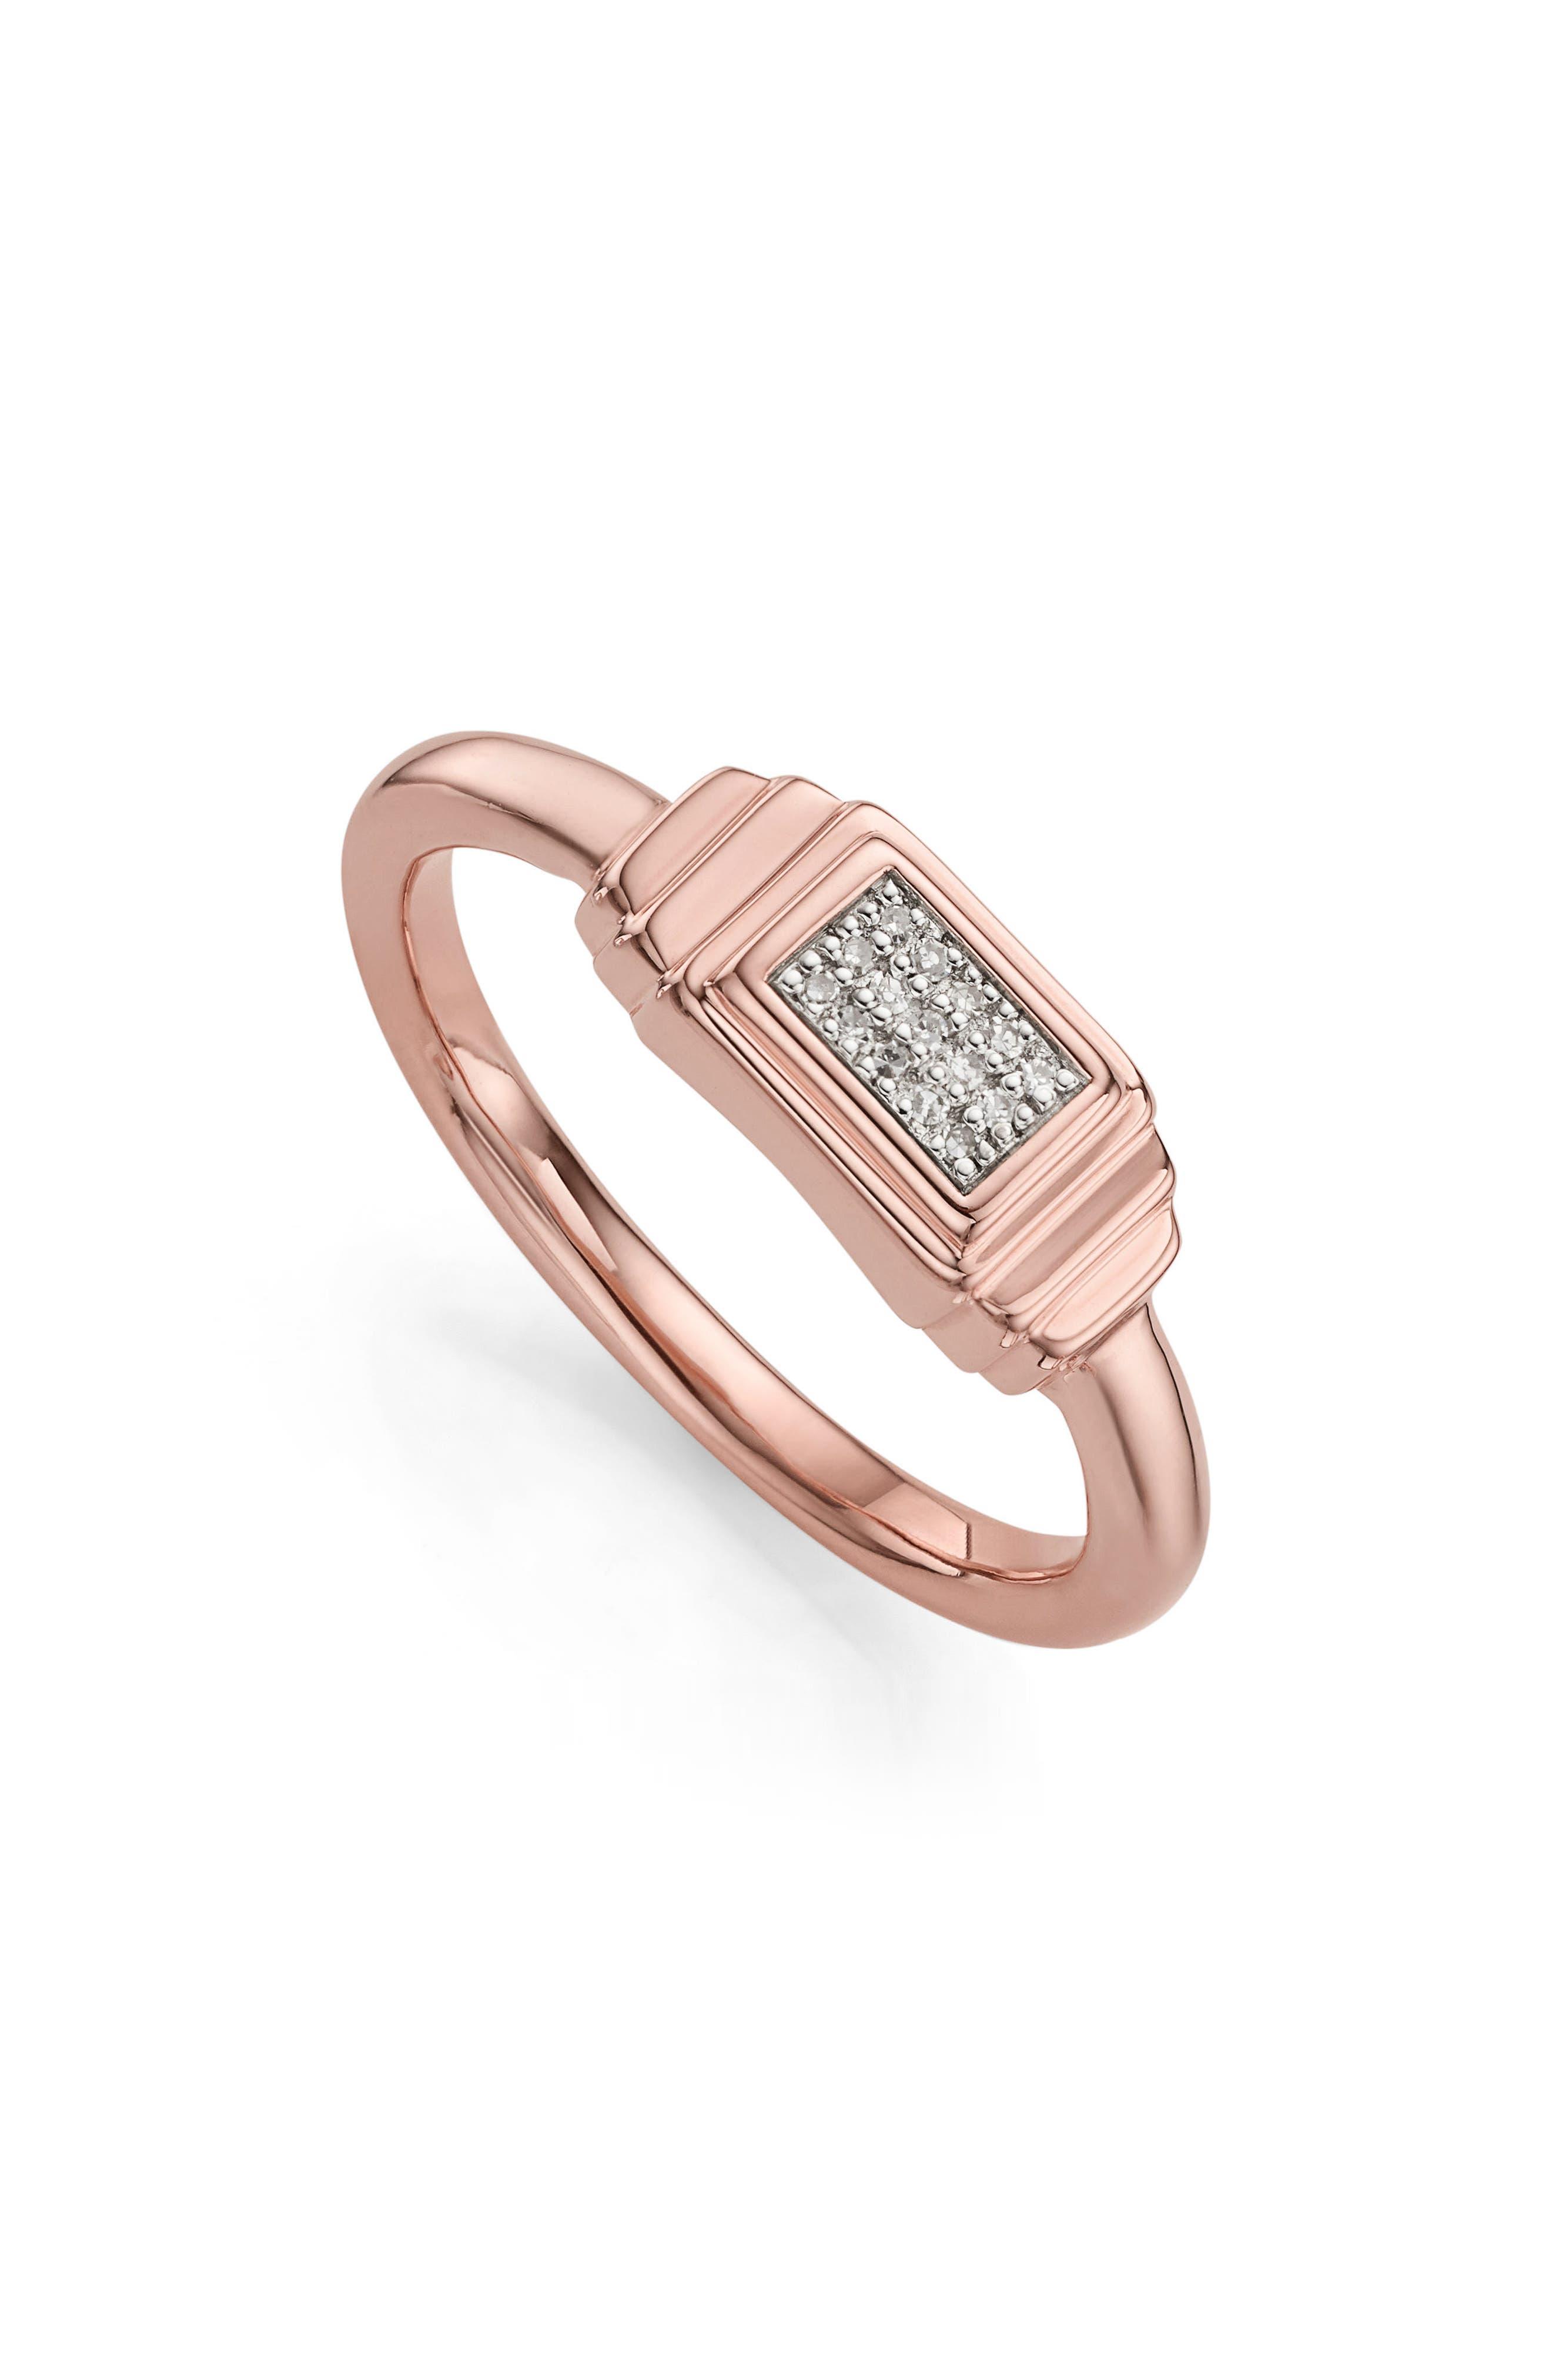 Baja Deco Diamond Ring,                         Main,                         color, ROSE GOLD/ DIAMOND